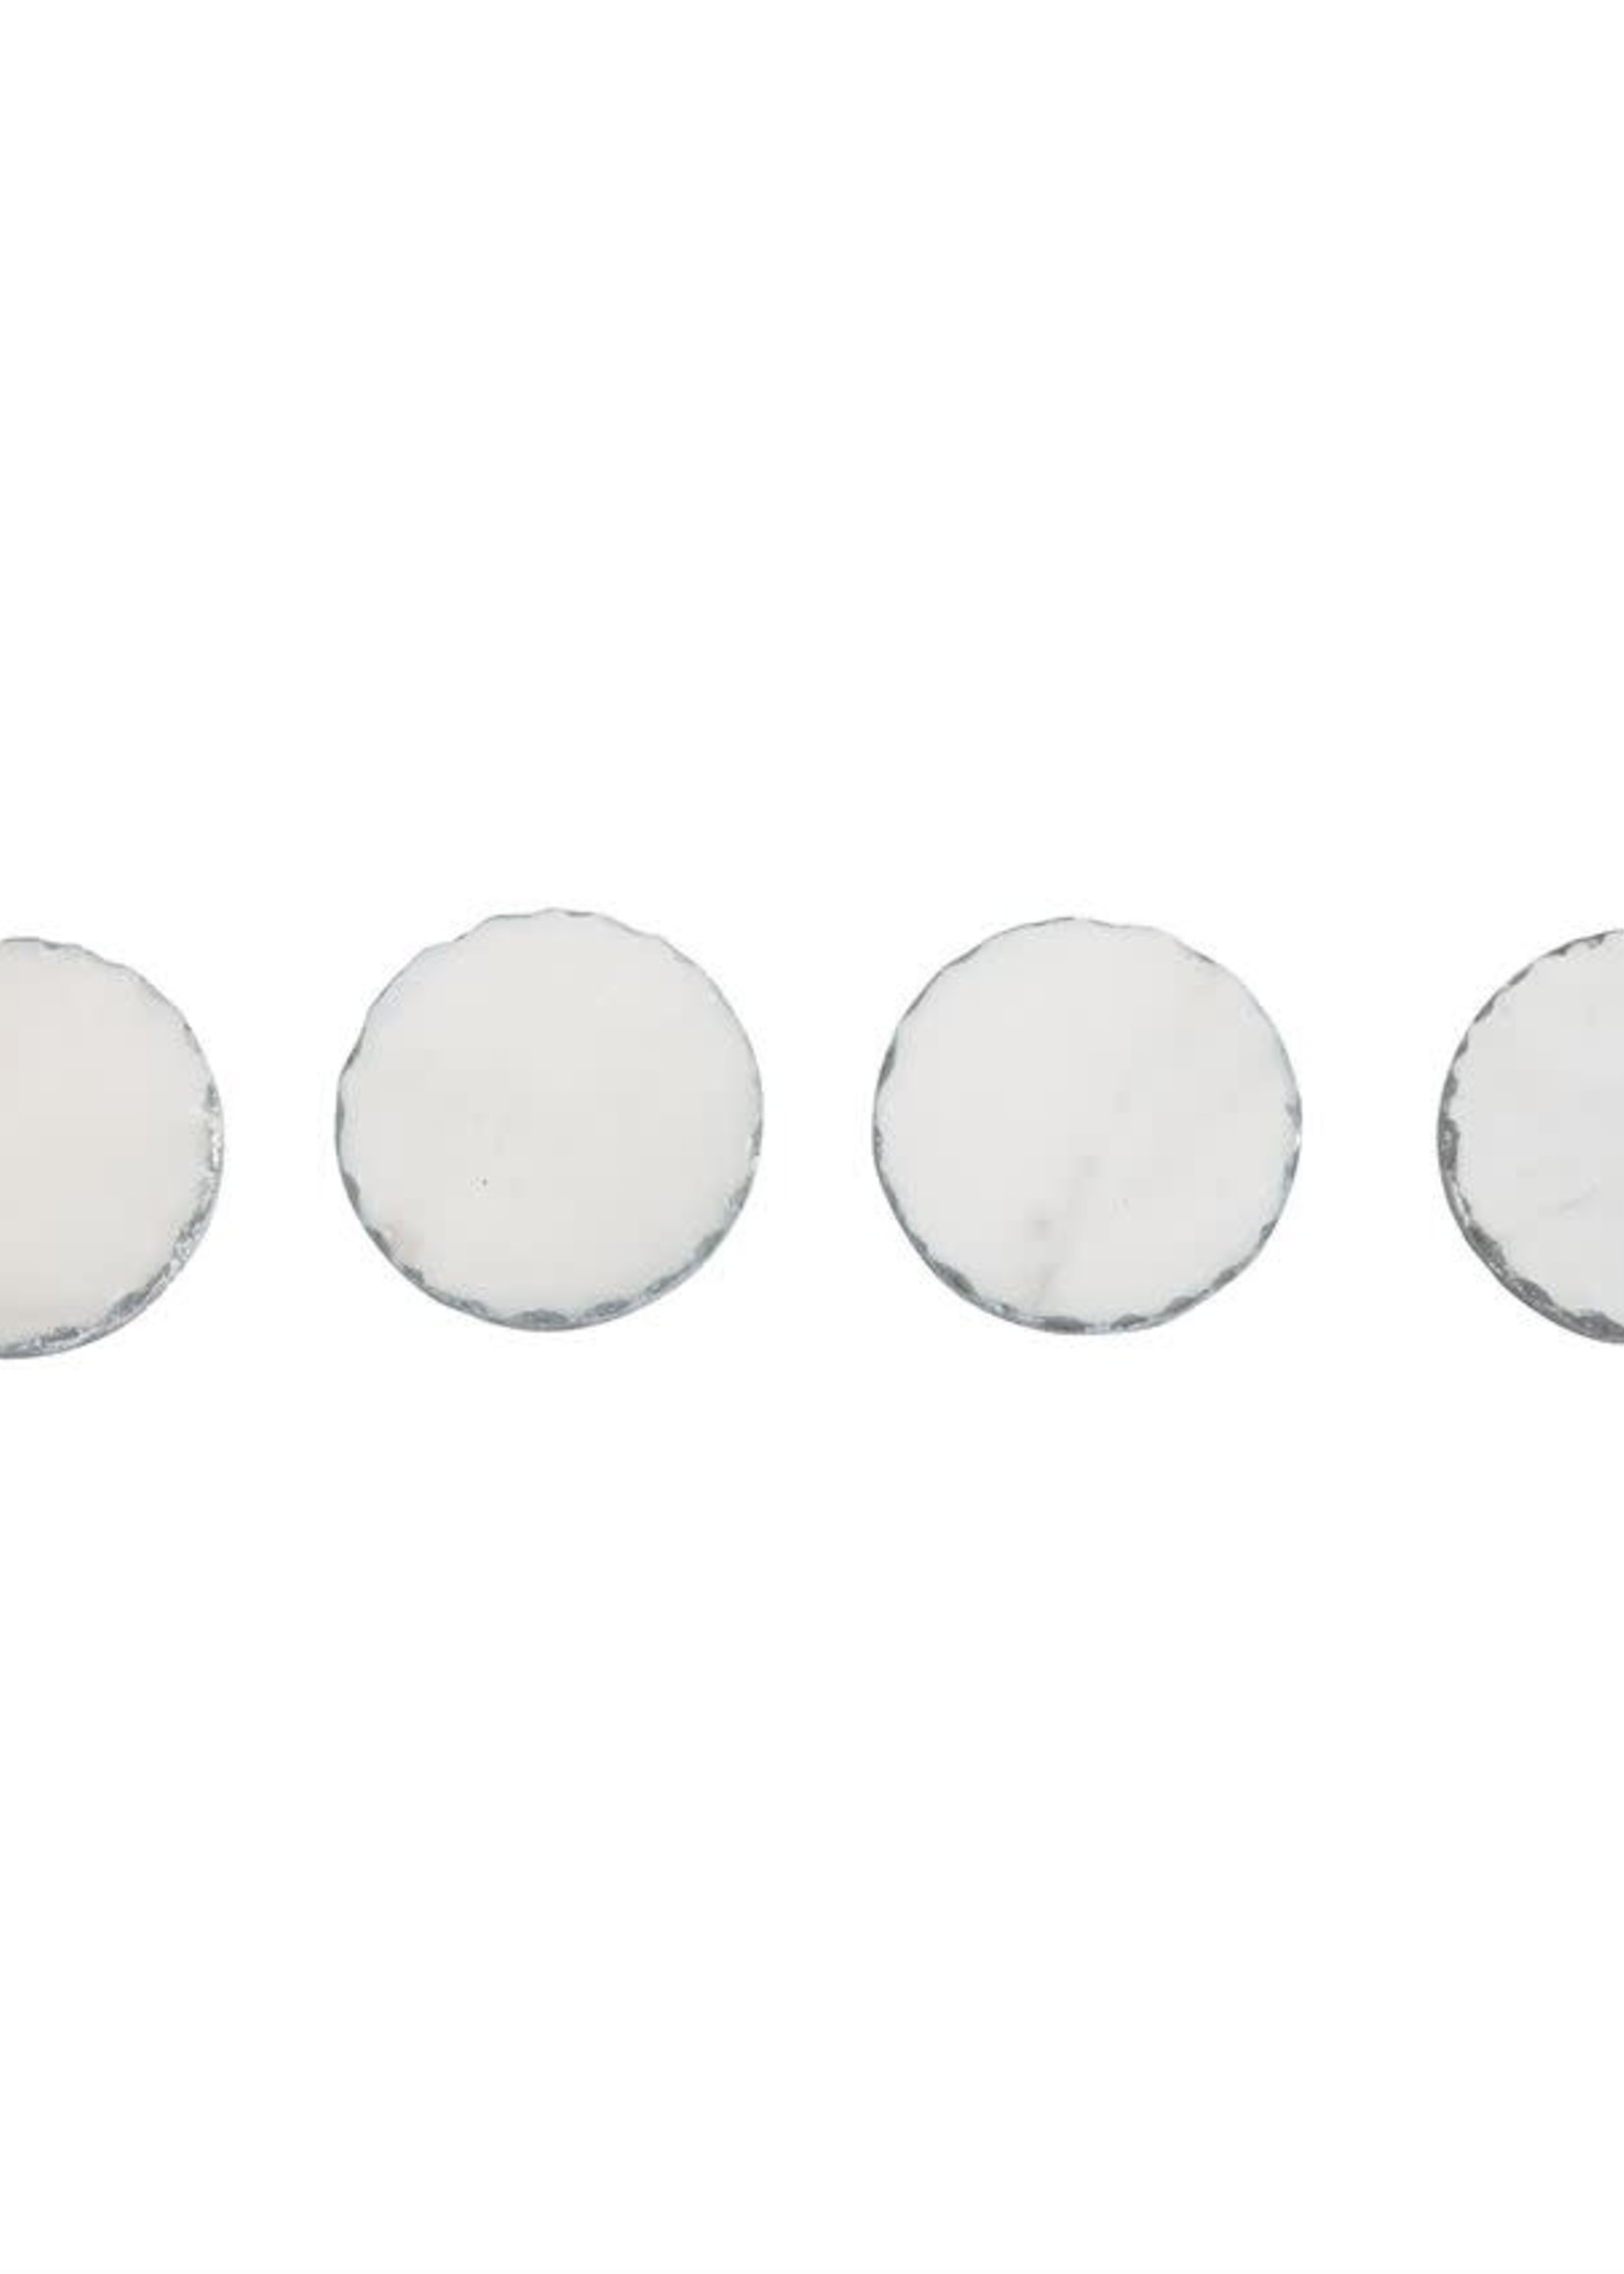 Mud Pie Silver Marble Foil Coaster Set/4